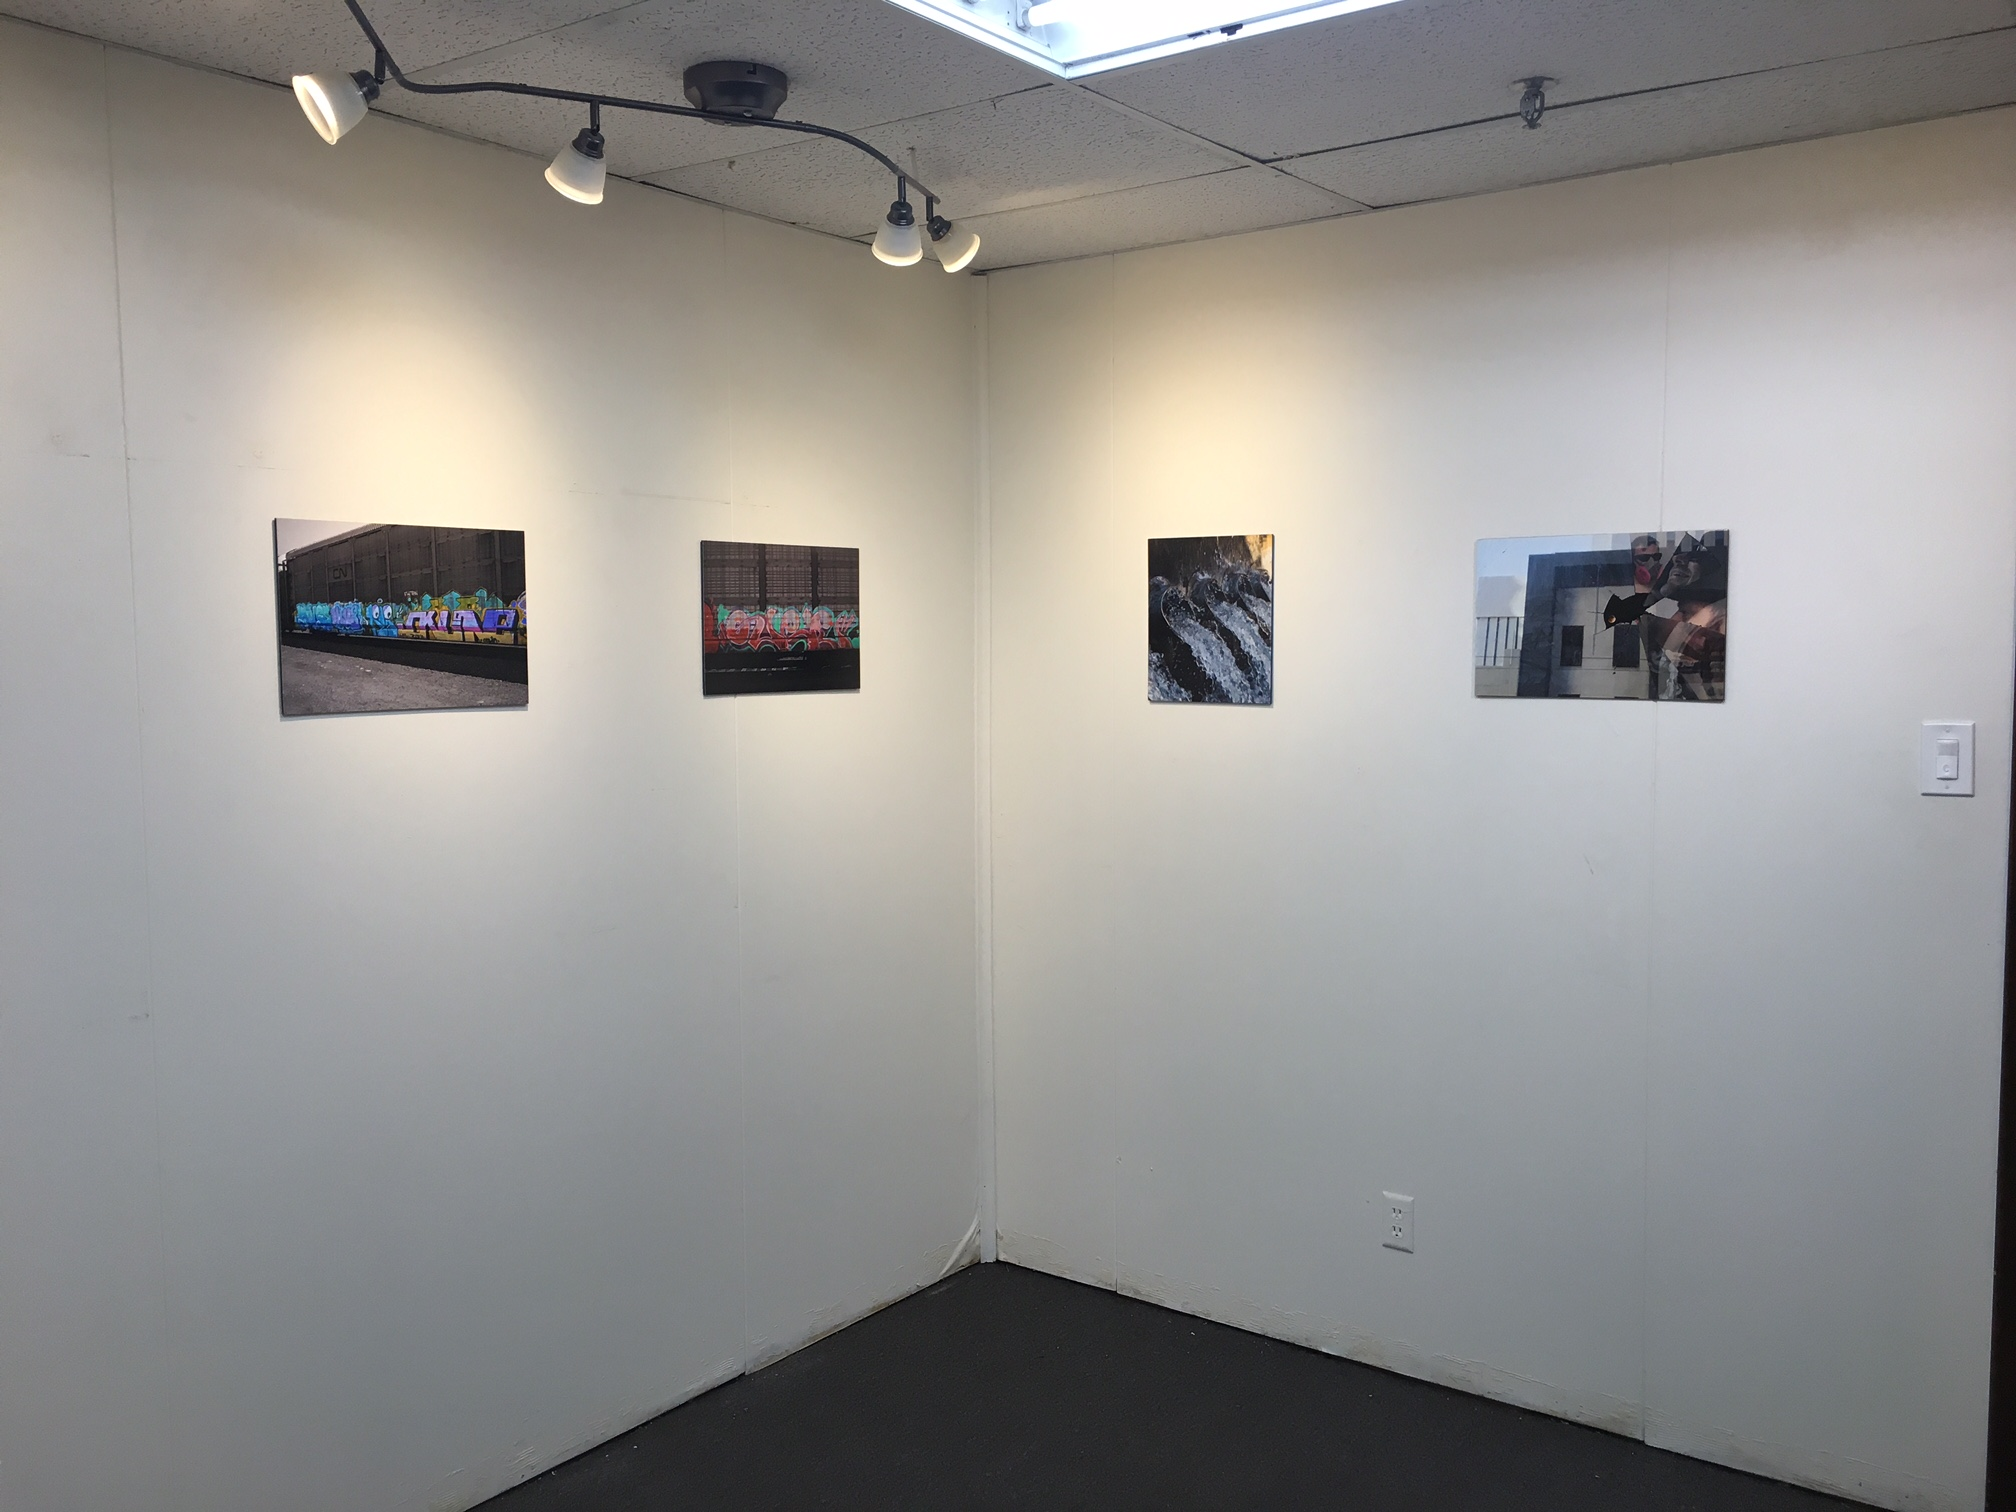 Nicholas Johnson, Installation image of corner and walls, 1-16-16.JPG